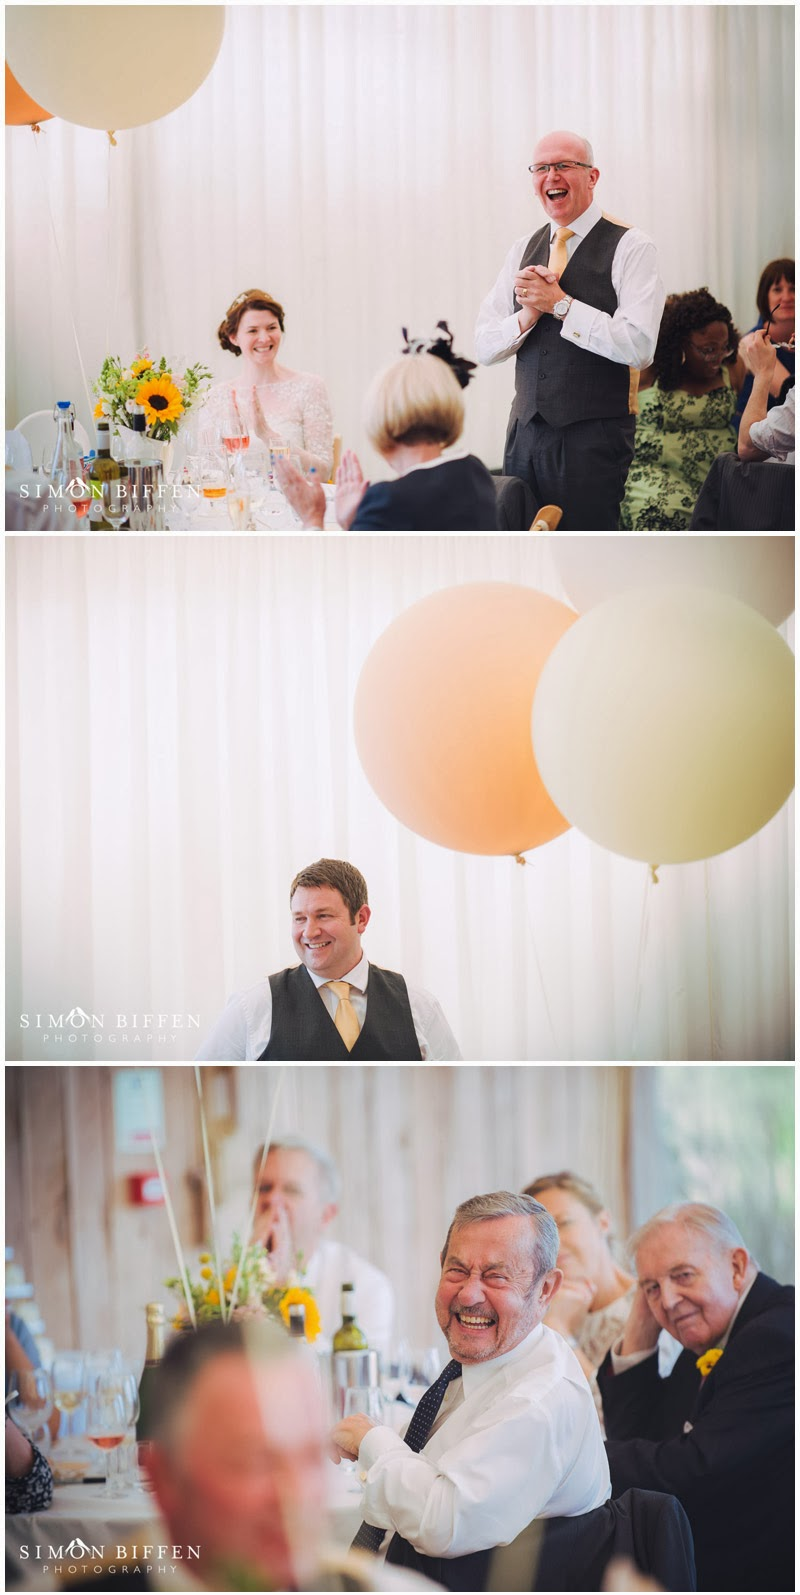 Wedding speeches at Trevenna Cornwall